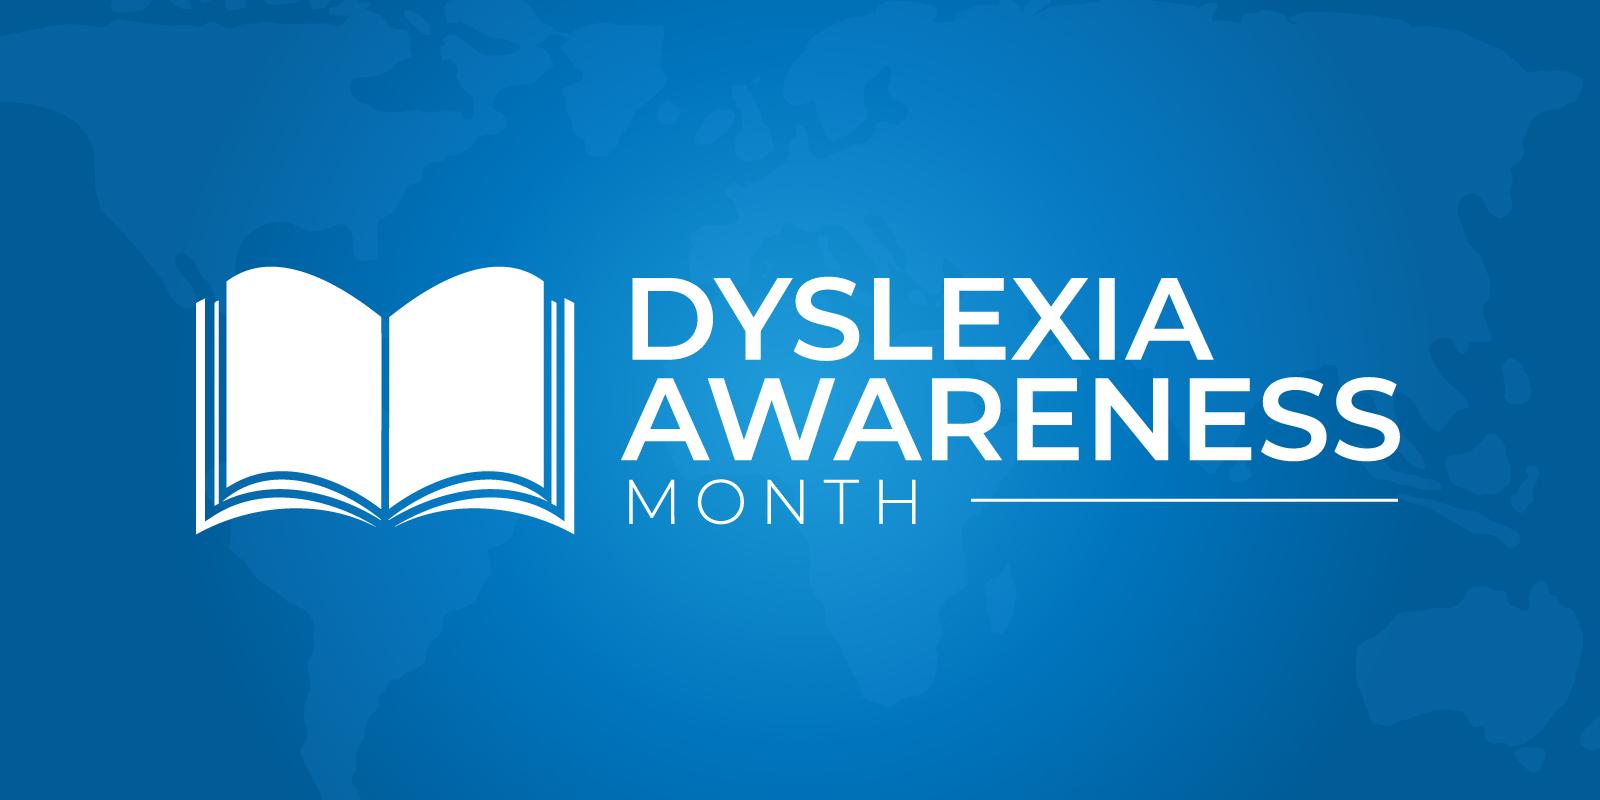 Dyslexia Awareness Month